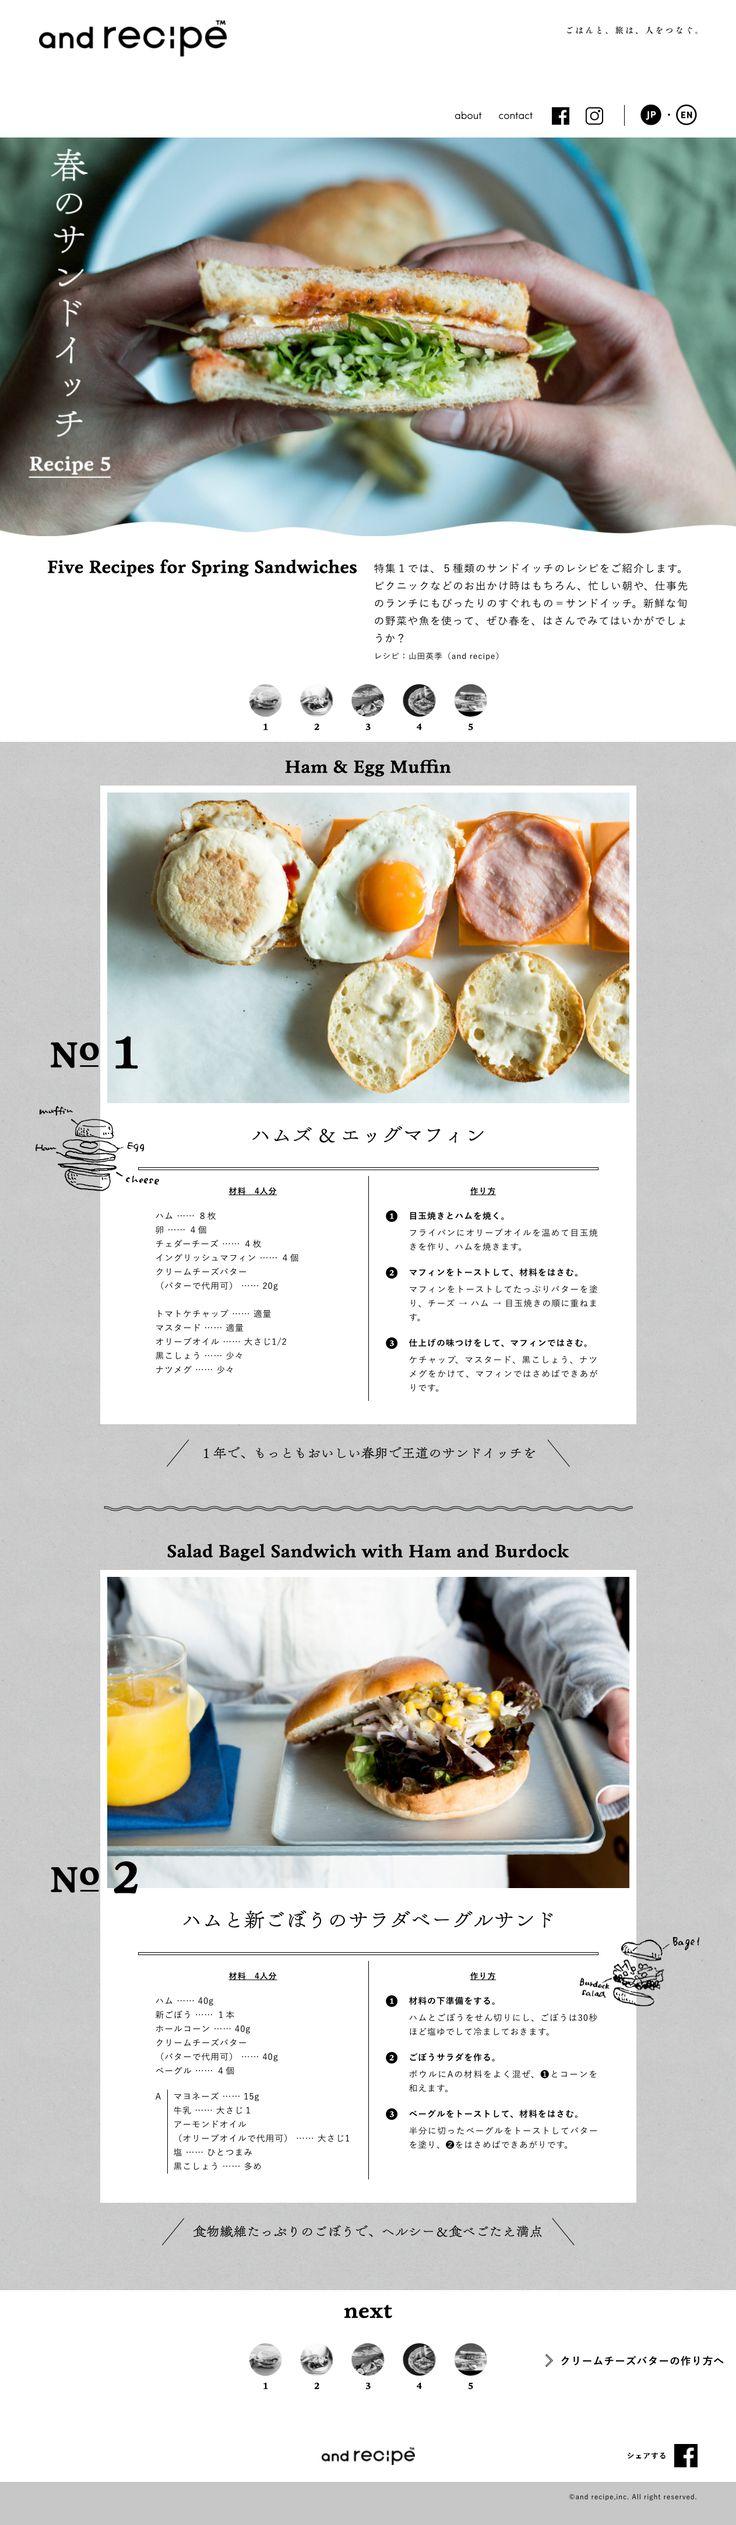 [and recipe] web magazine 3 | キタダデザイン 写真の雰囲気と、あしらいがかわいすぎる。好き...